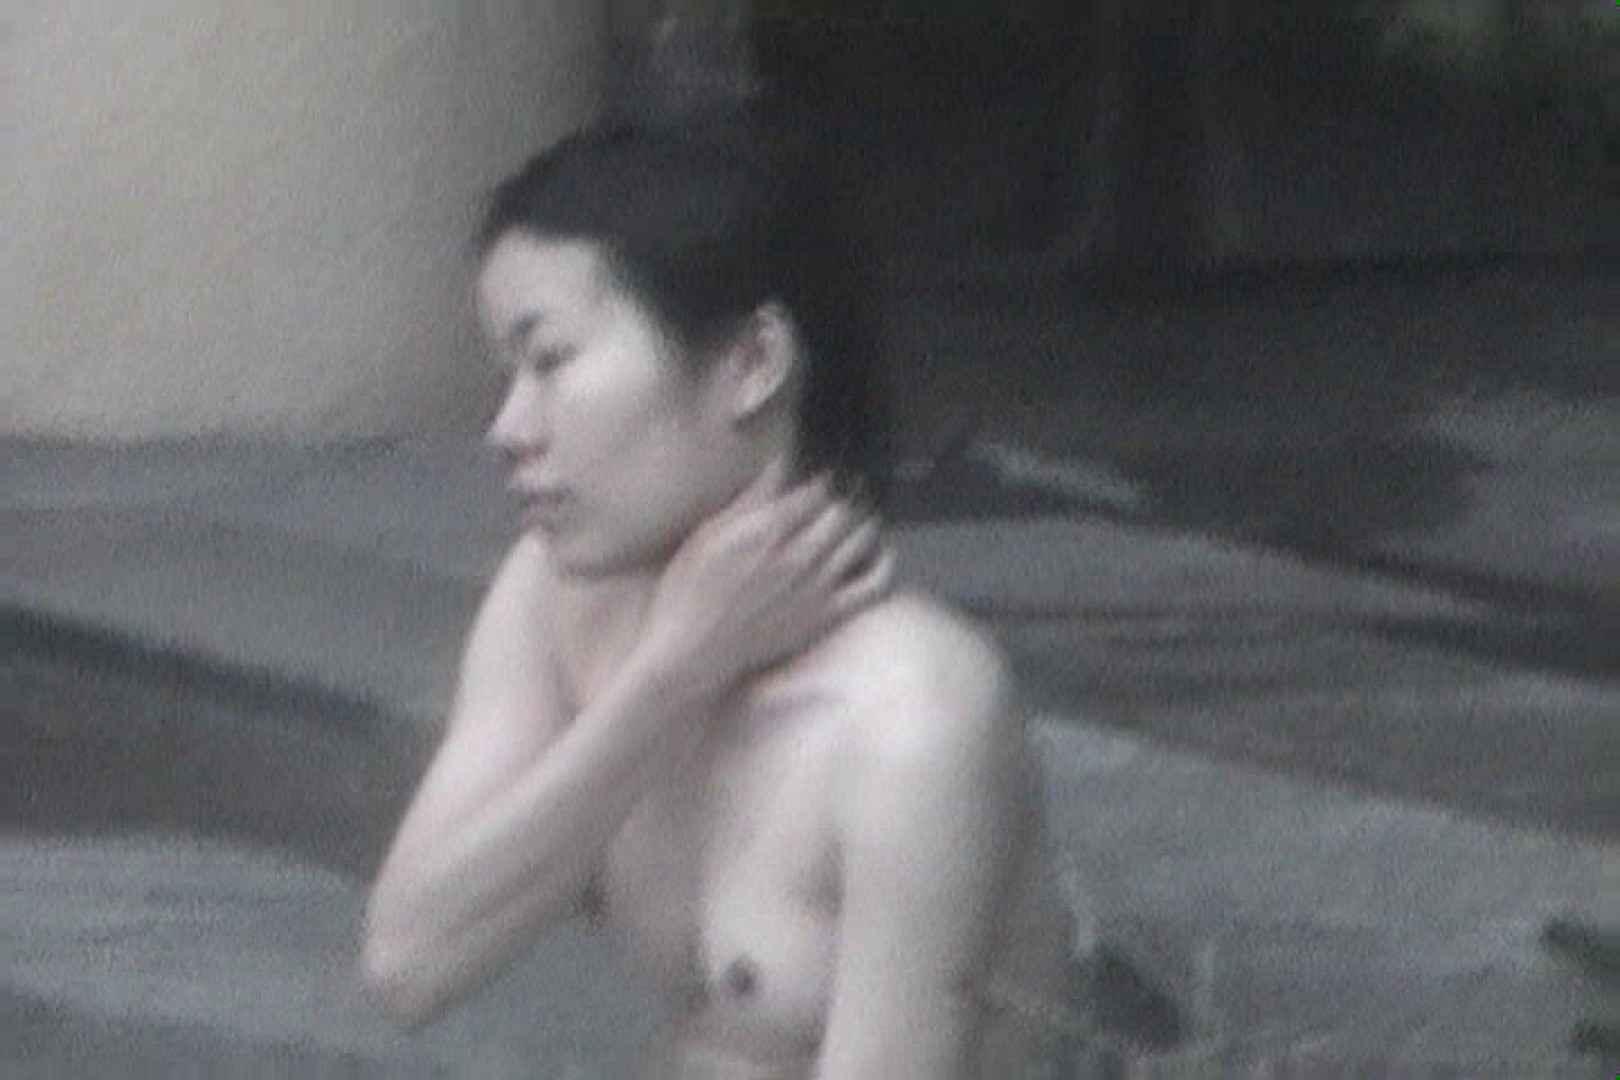 Aquaな露天風呂Vol.556 露天風呂編 | 盗撮シリーズ  99PIX 71